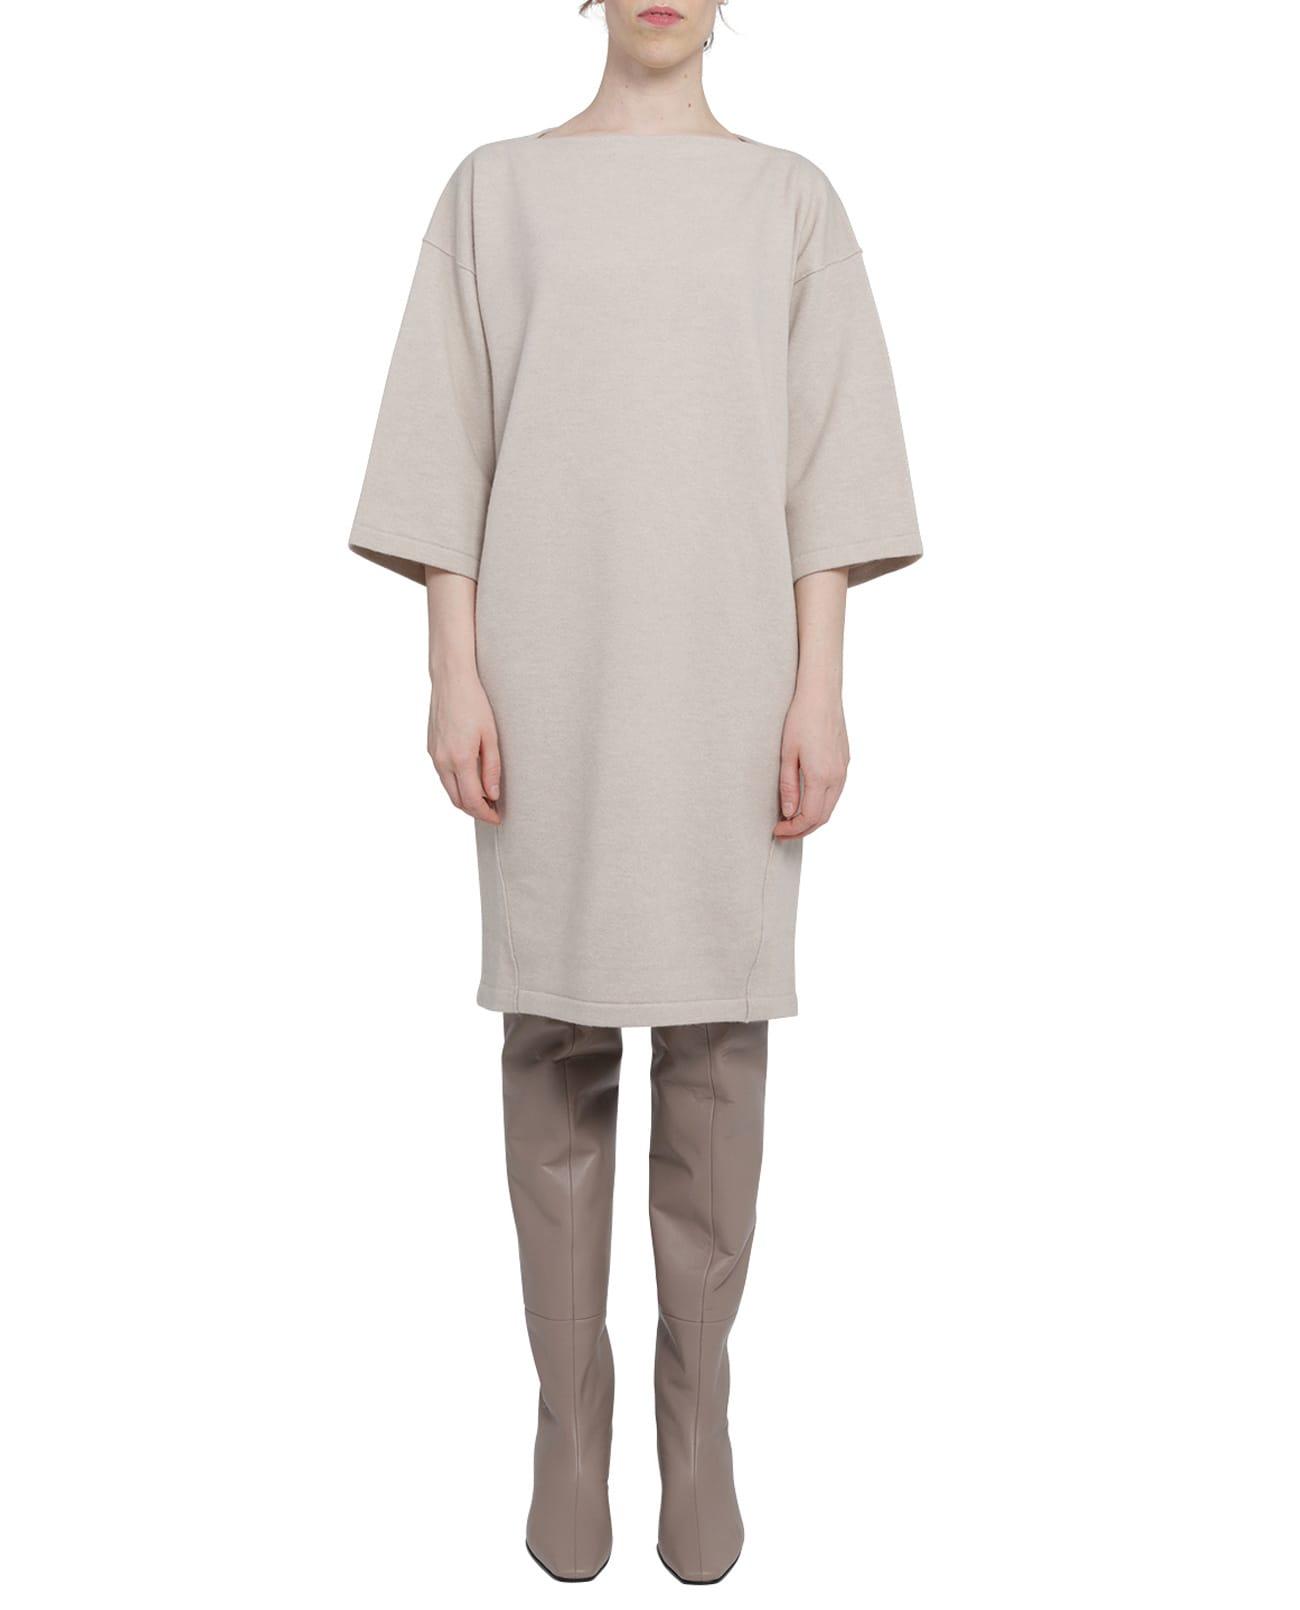 Portofino Beige Dress